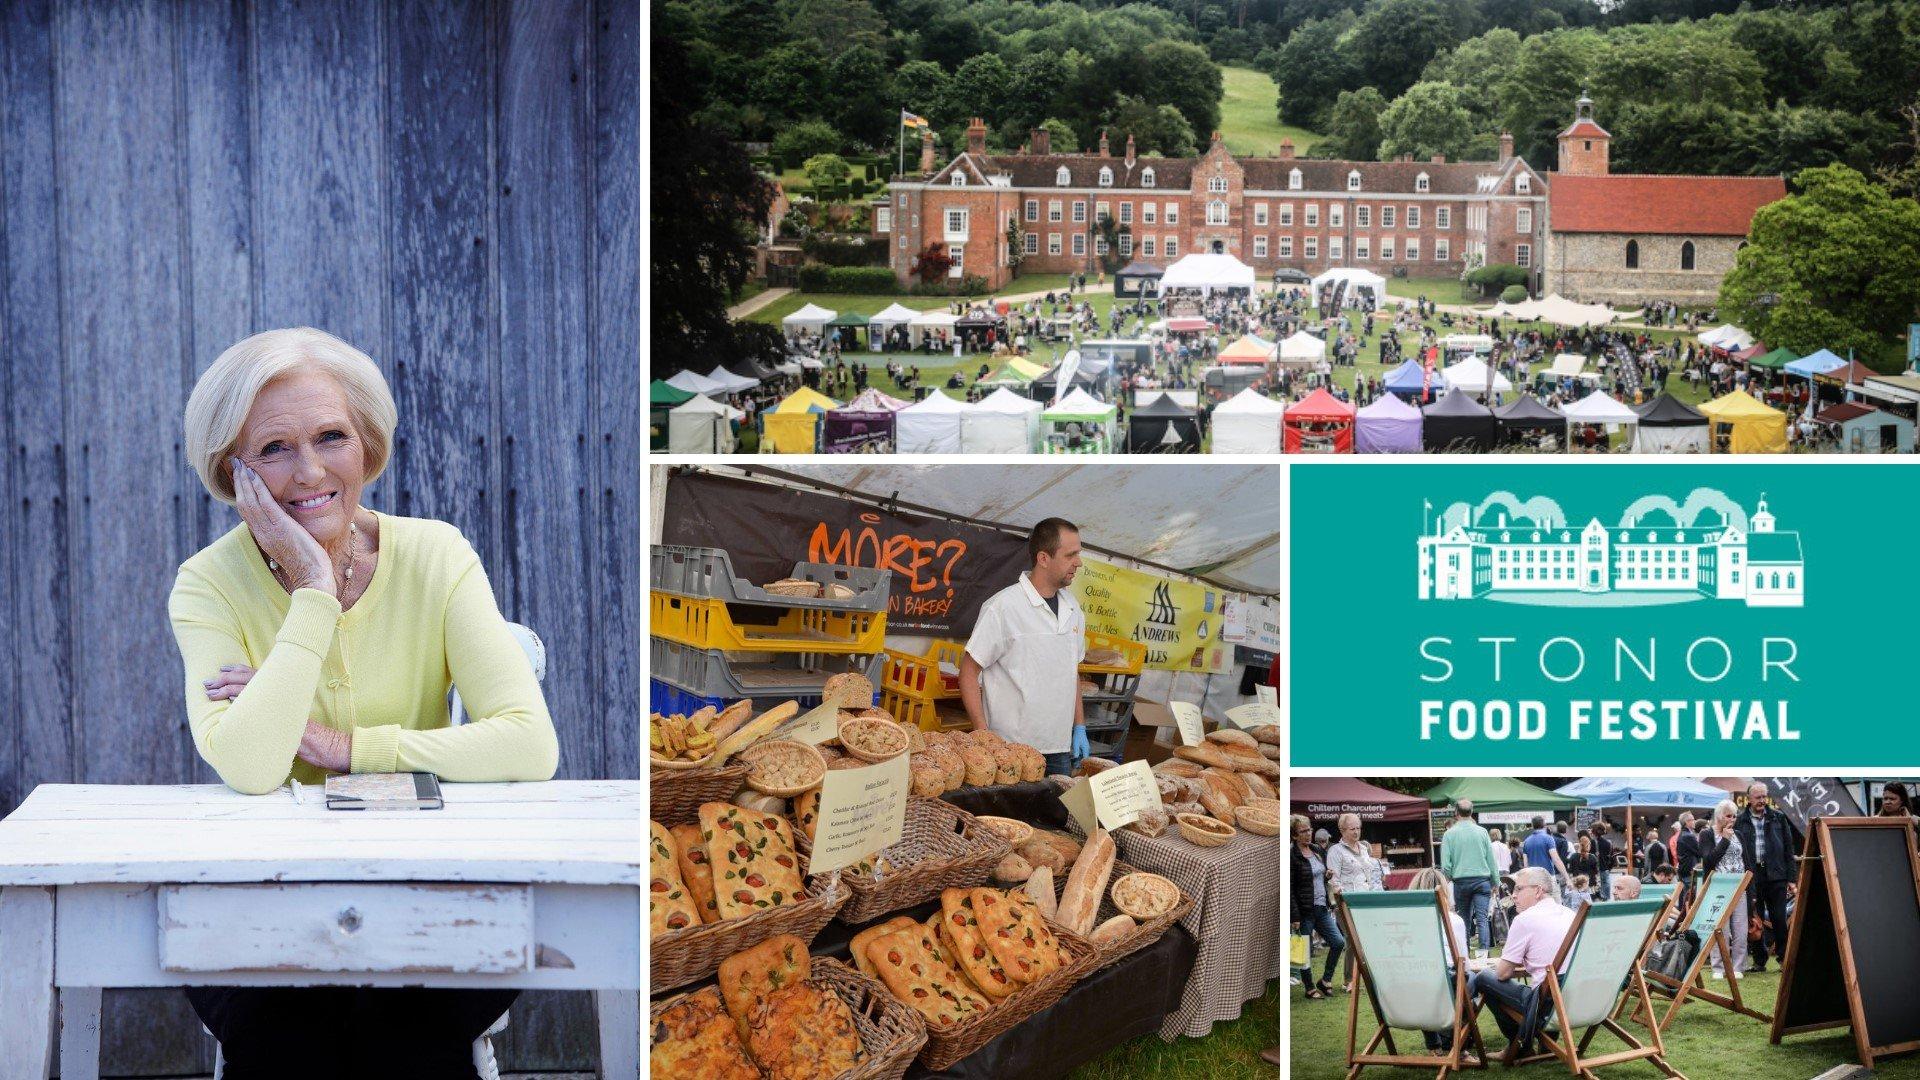 Stonor Park Food Festival